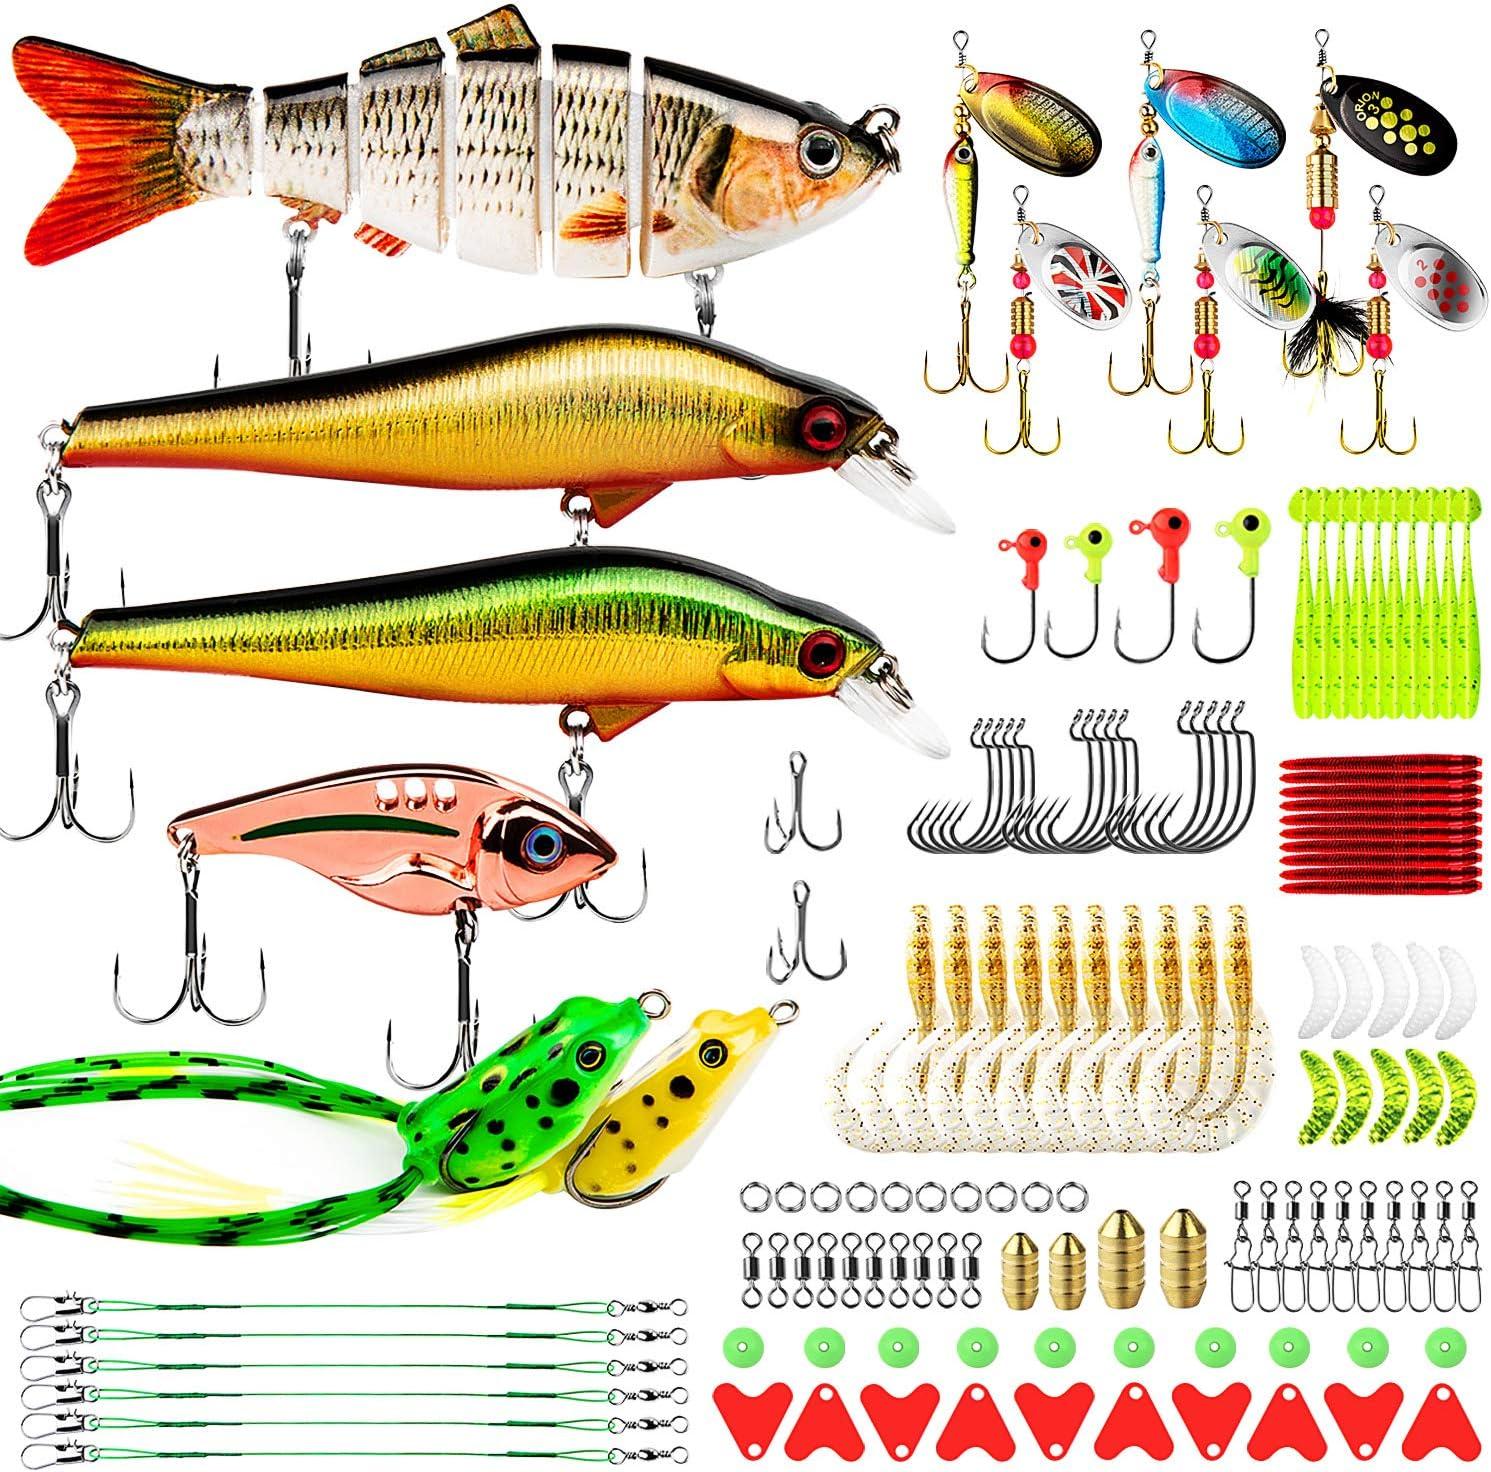 7cm Soft Material Bait Fishing Lure Simulation jumping Fish Bait New Swimbaits